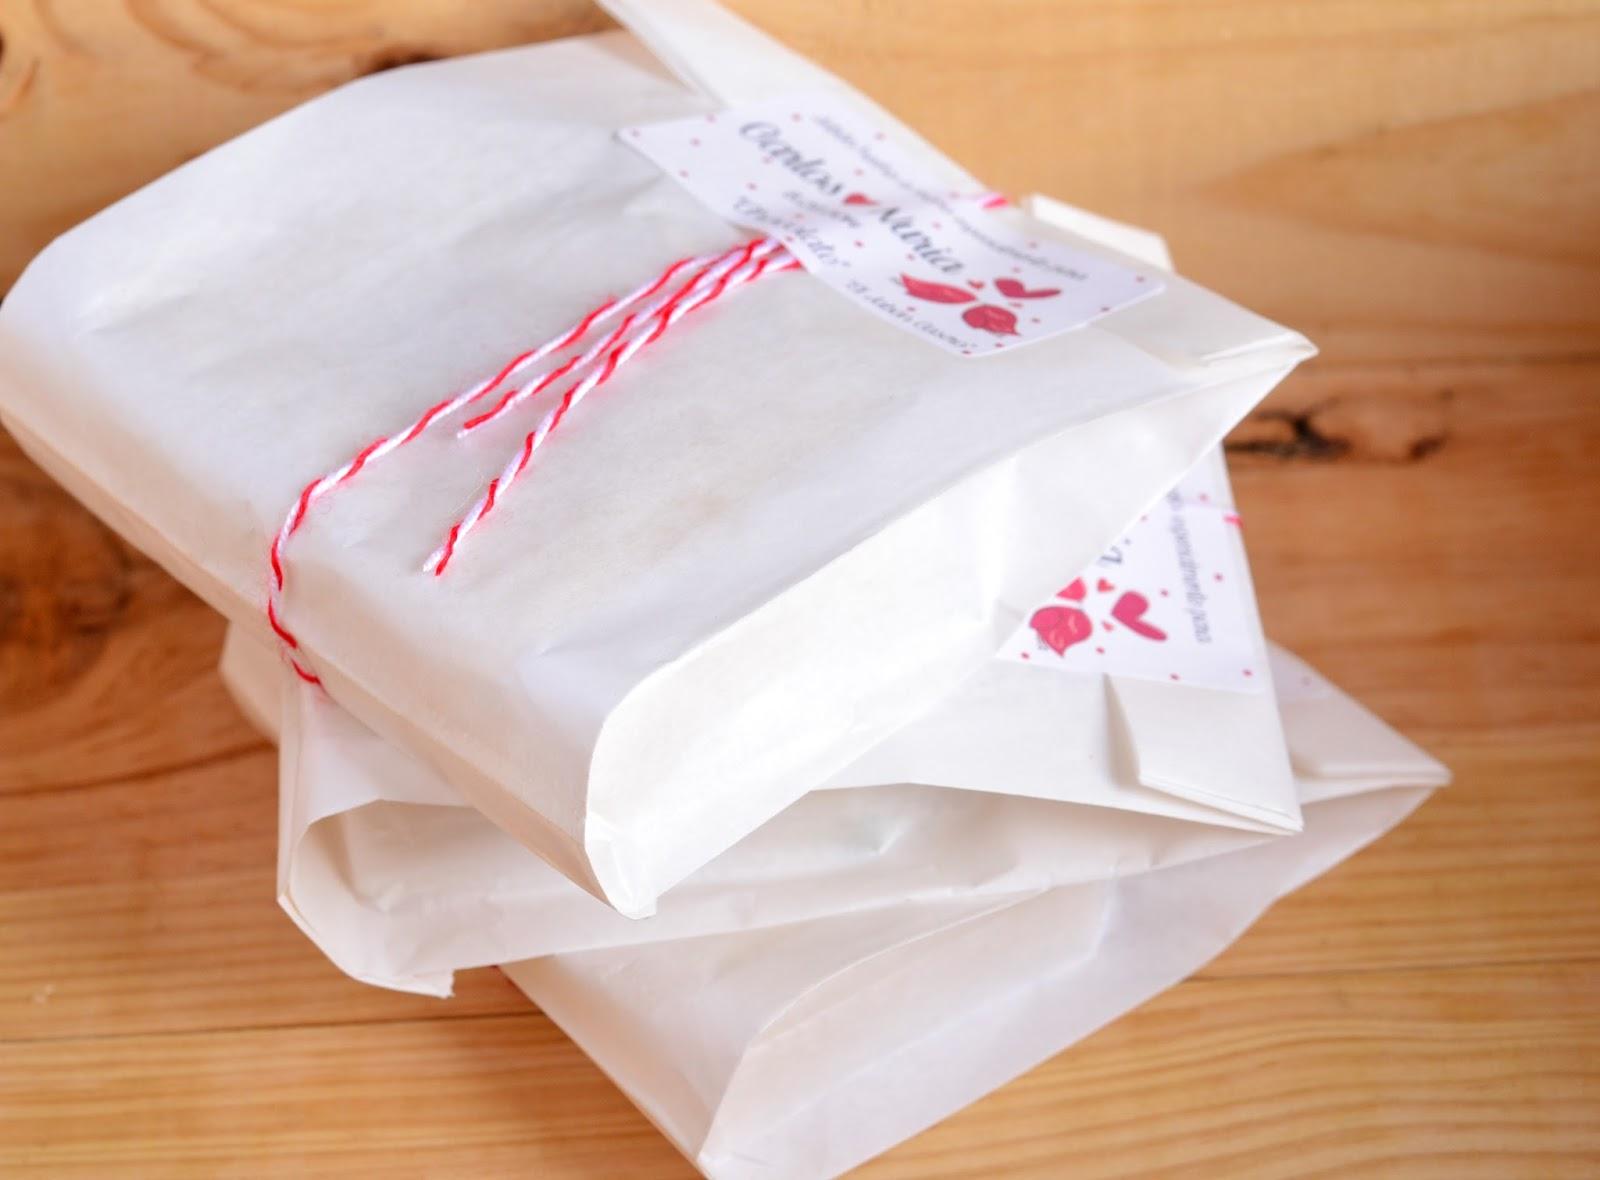 Detalles de boda jabones en bolsitas de papel